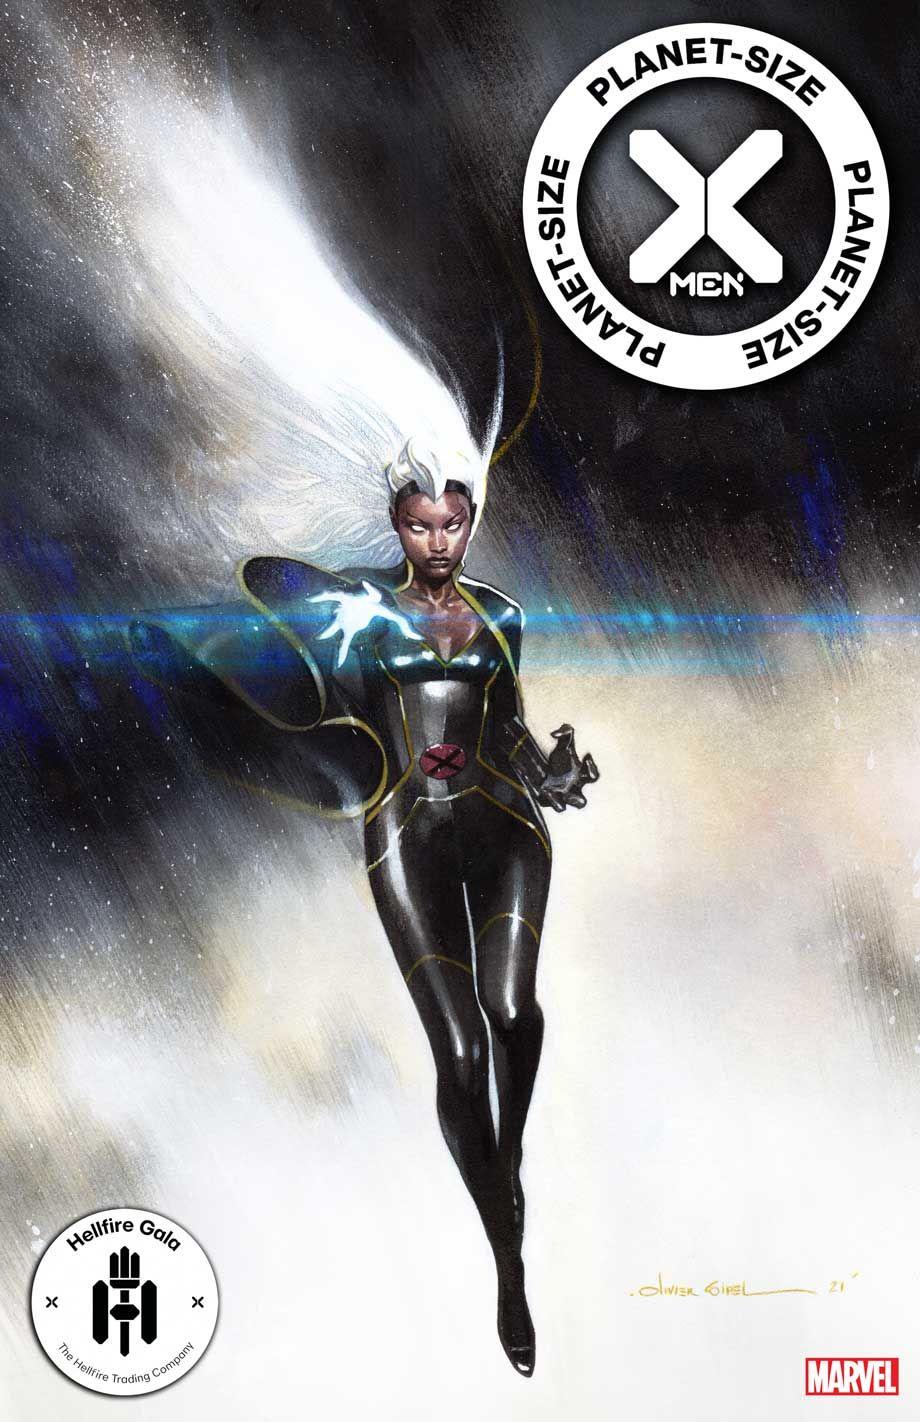 PSXMEN2021001_Coipel-var First Look at PLANET-SIZE X-MEN #1 from Marvel Comics